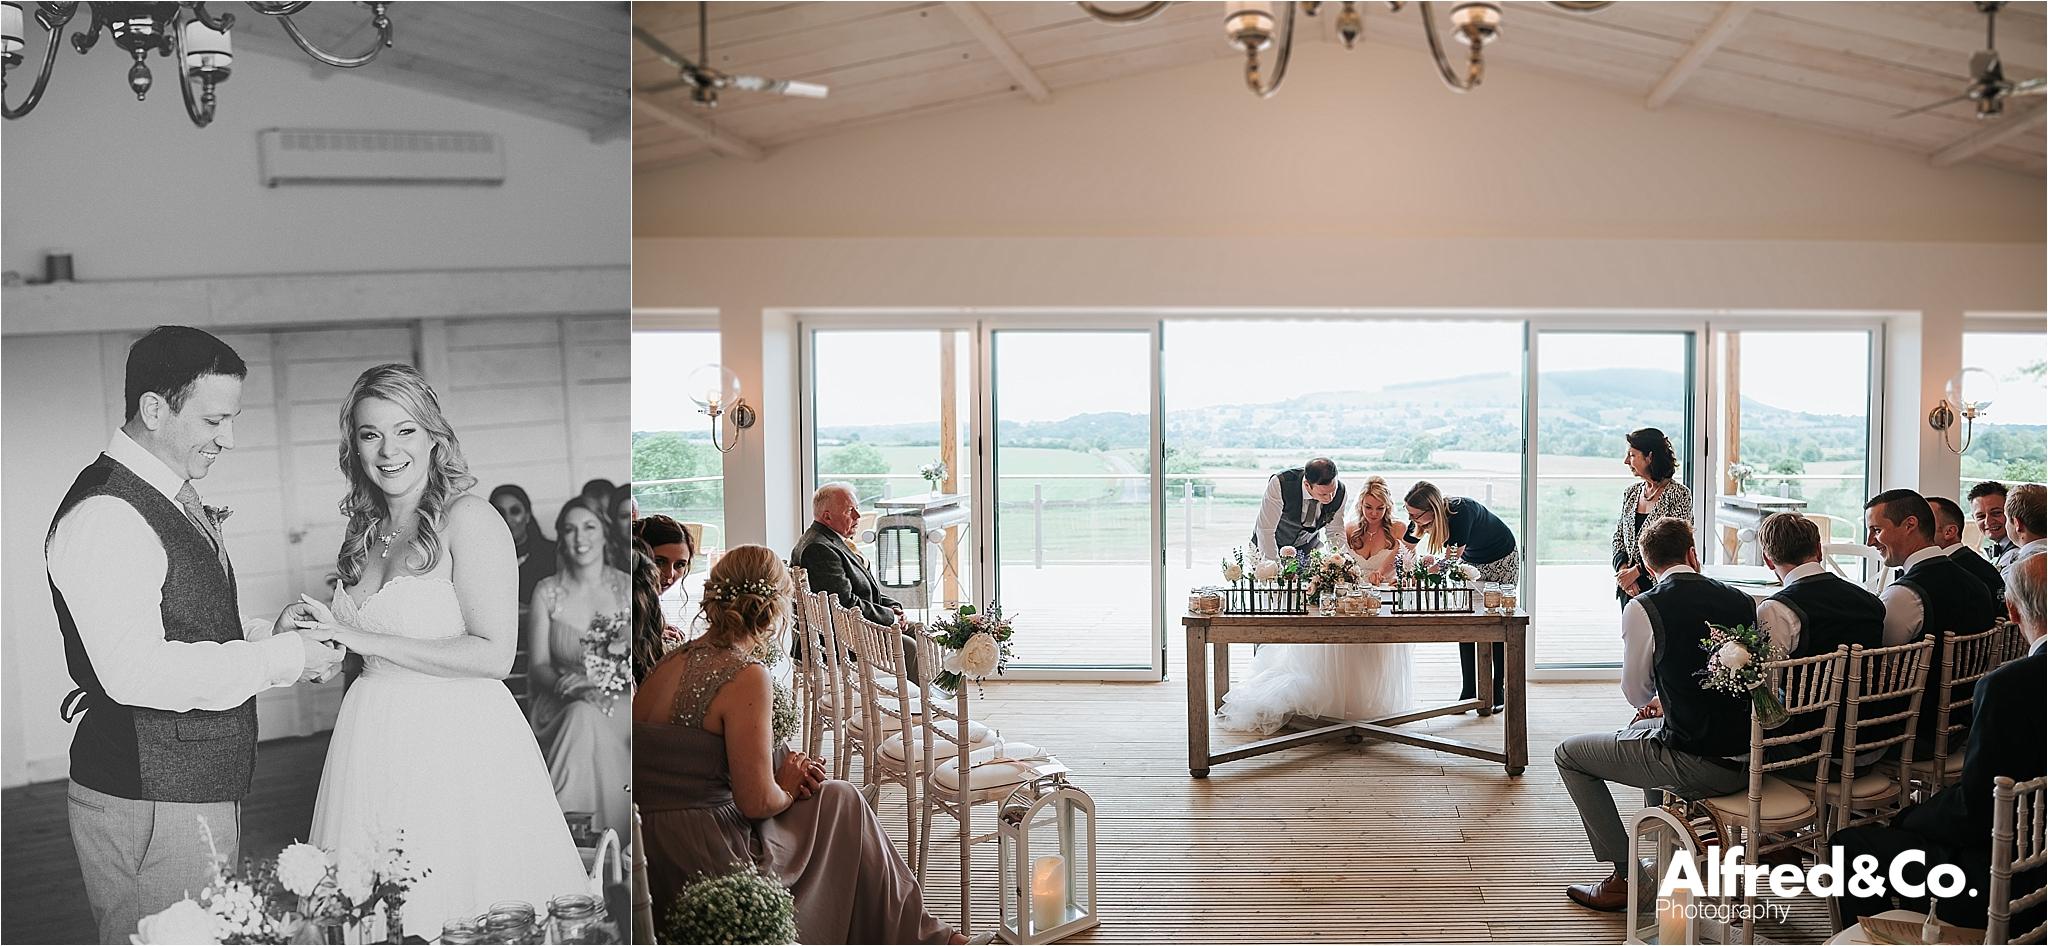 bashall barn wedding venue in clitheroe